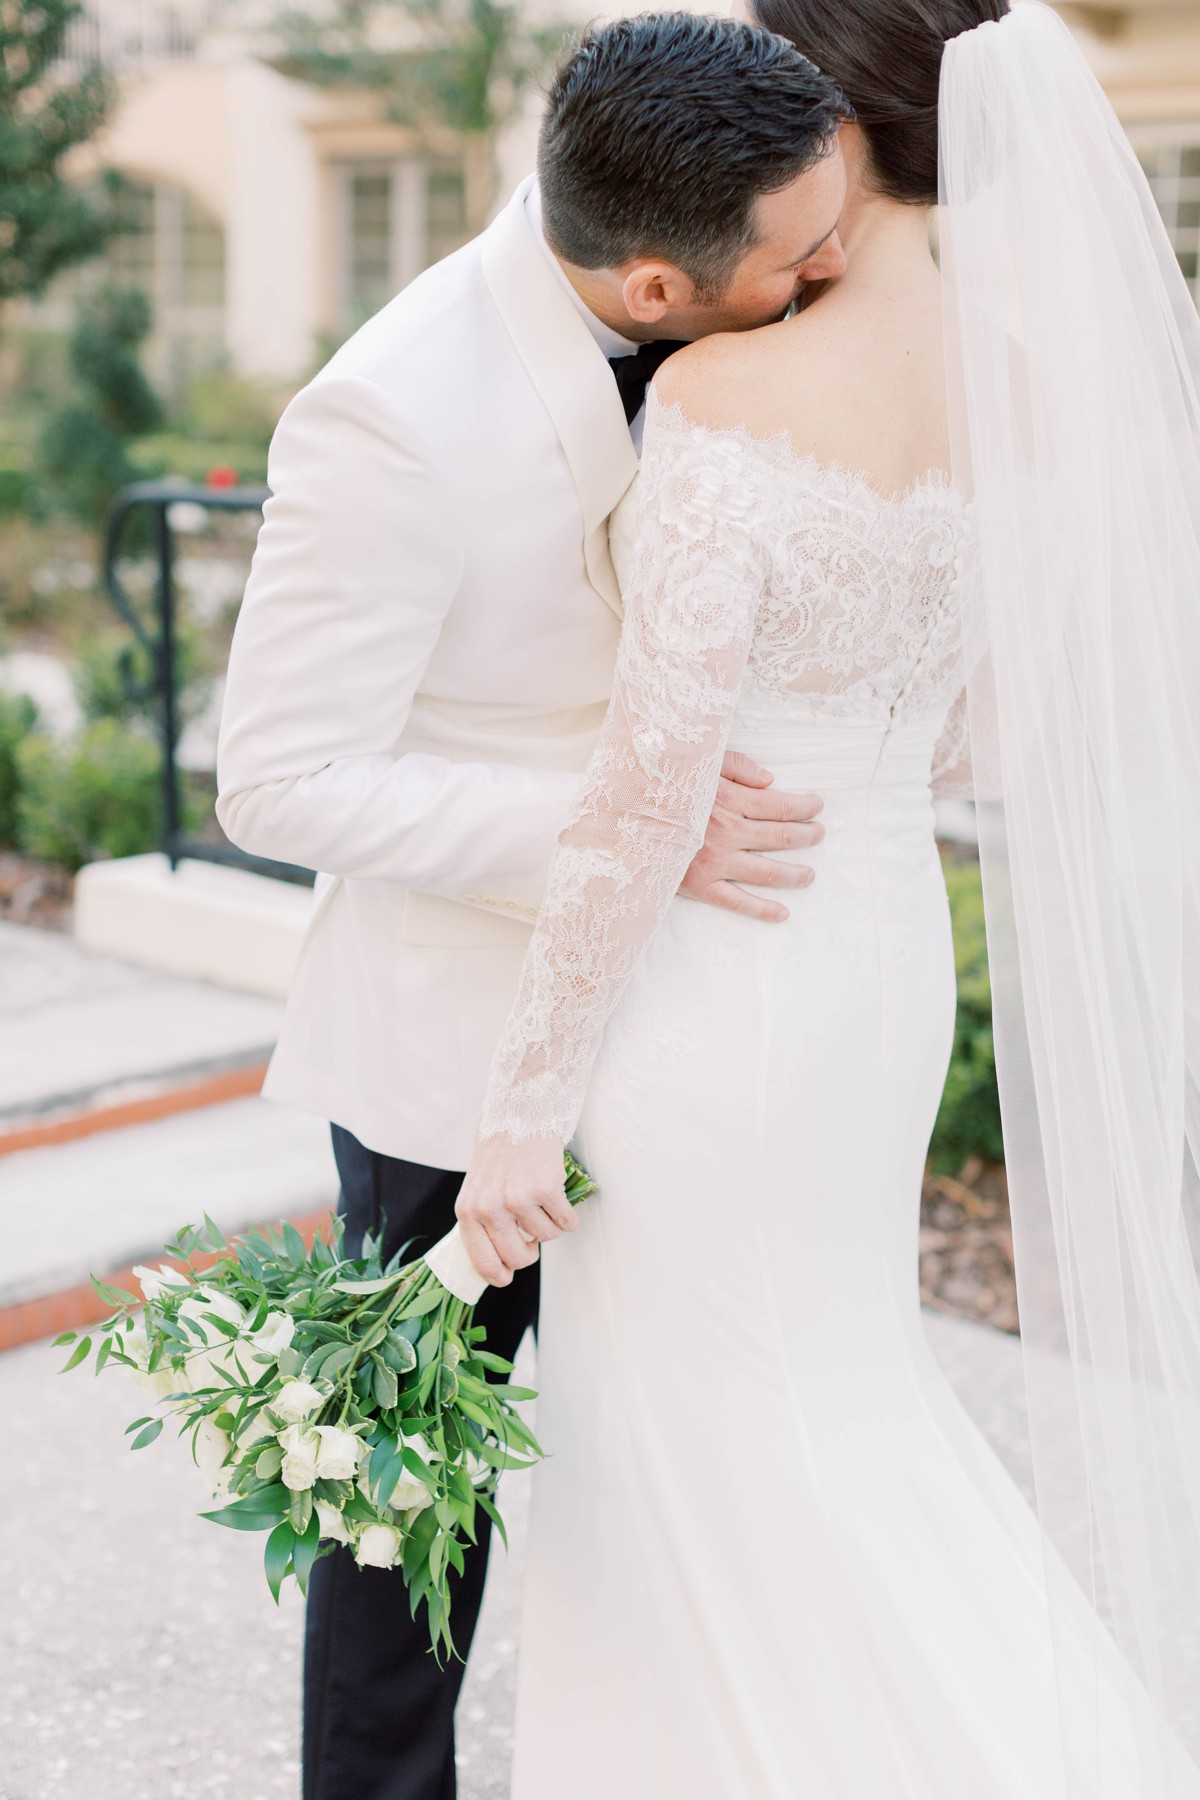 Alfond-Inn-Wedding-Winter-Park-Wedding-Photographer-Chantell-Rae-Photography_0018.jpg